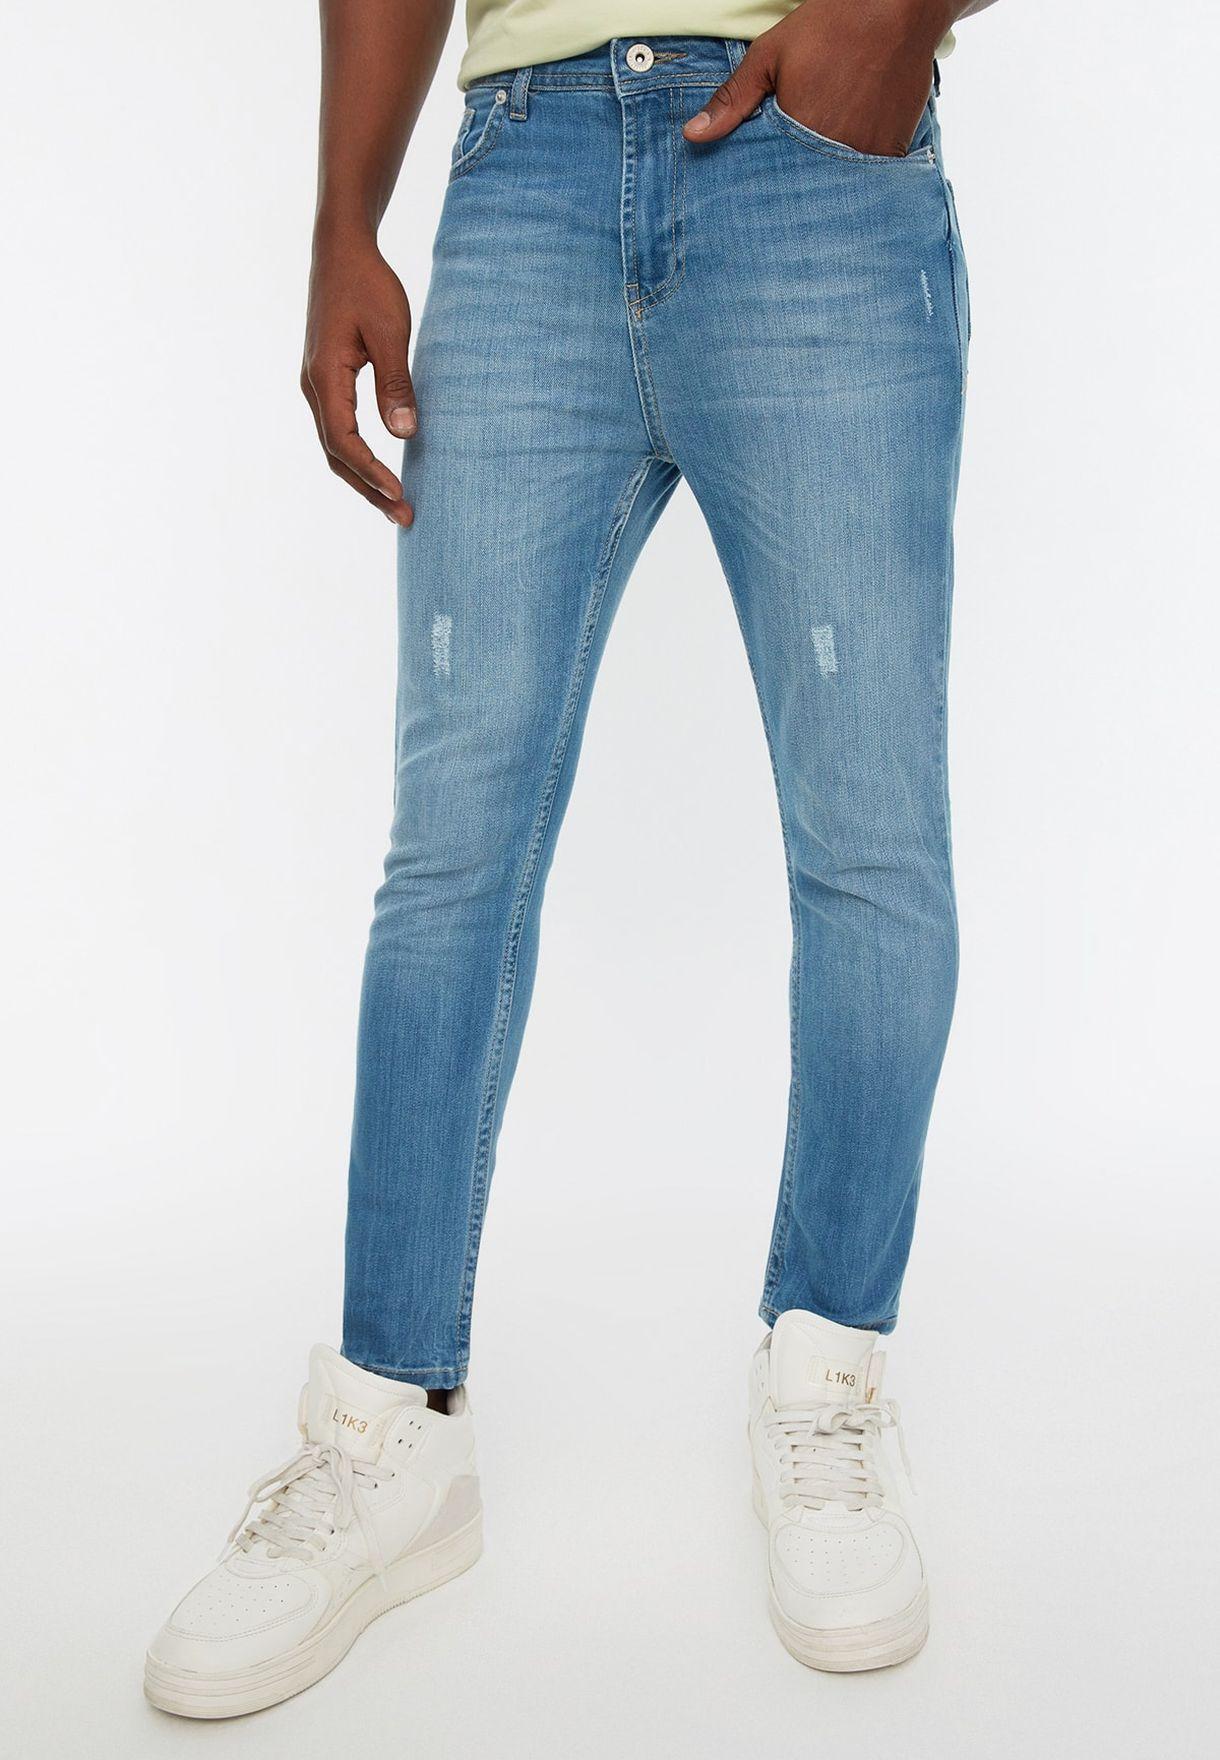 Light Wash Skinny Fit Jeans